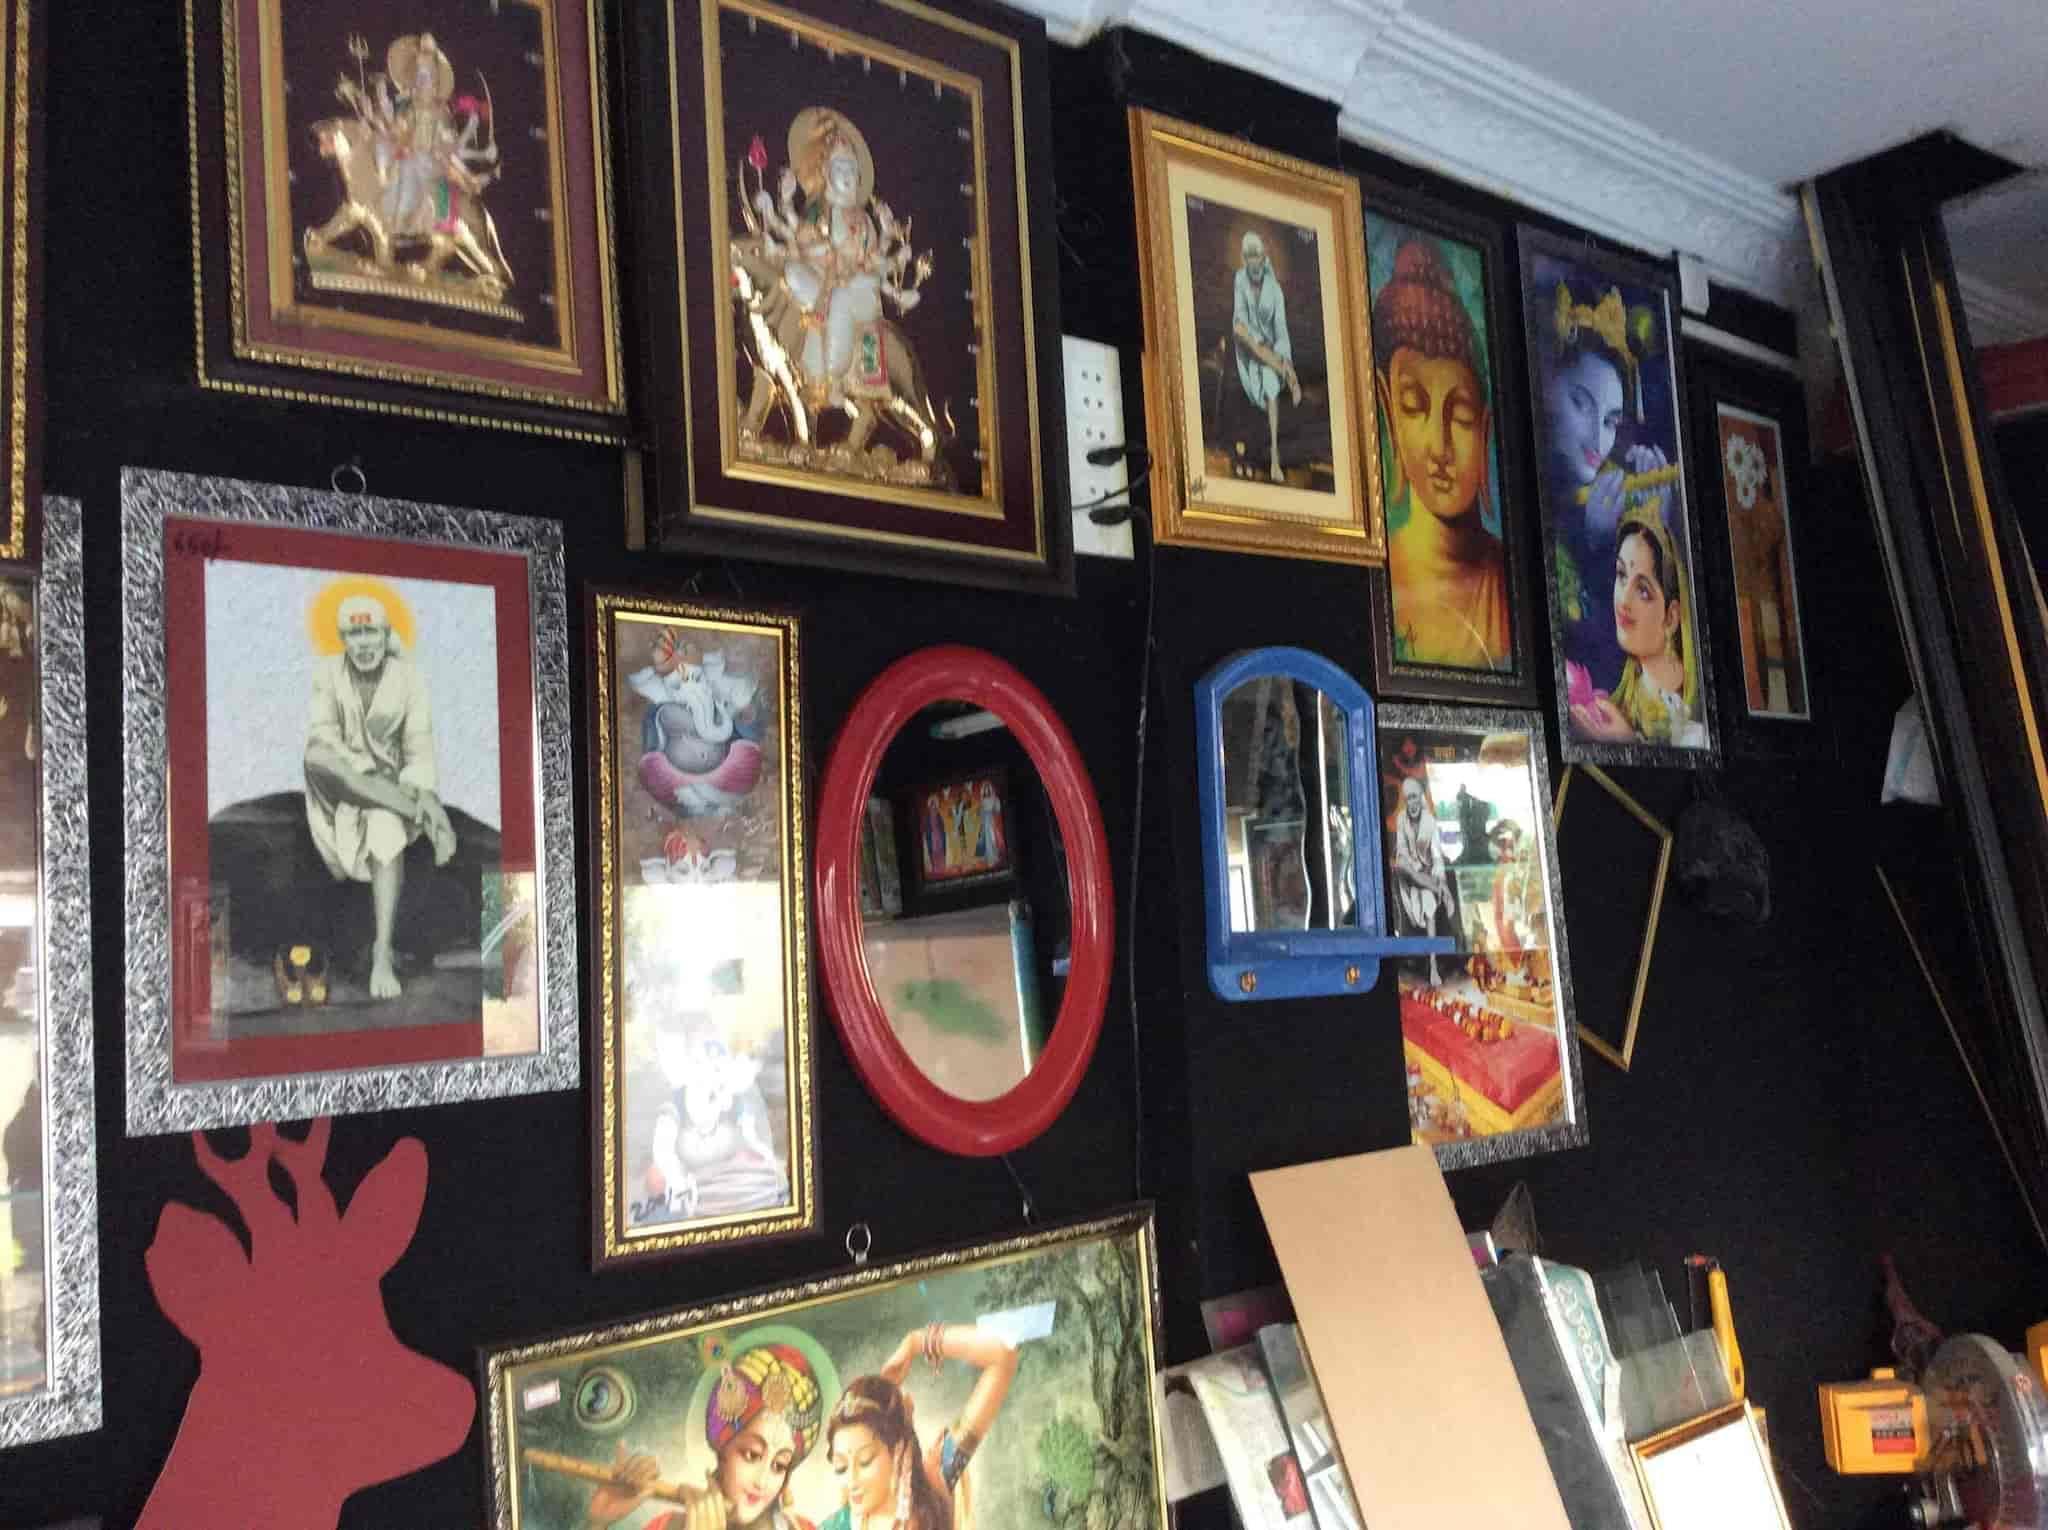 Ss Photo Frames Works Photos, Governerpet, Vijayawada- Pictures ...